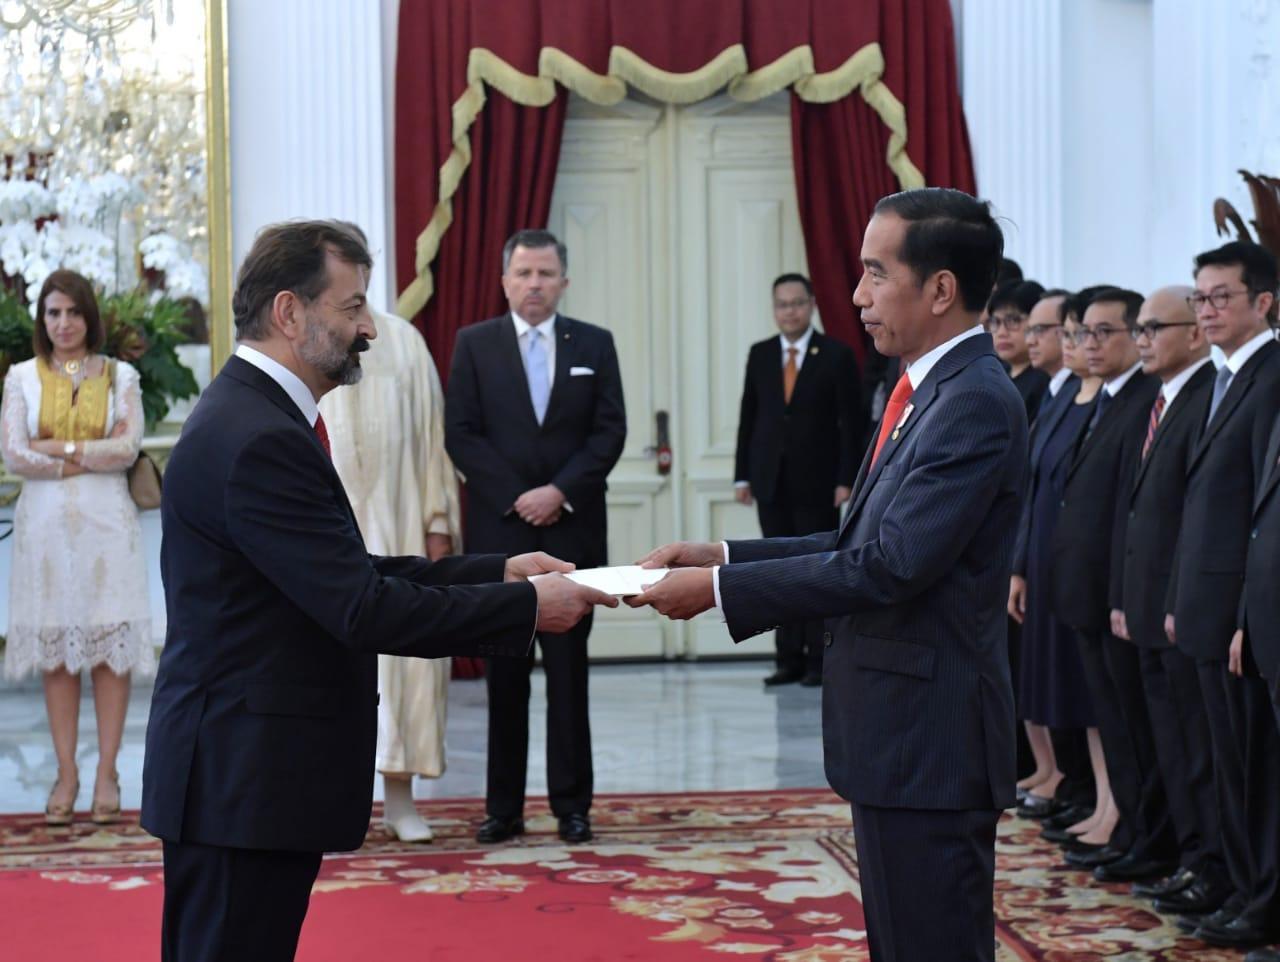 Presiden Jokowi Terima Surat Kepercayaan 11 Duta Besar Negara Sahabat